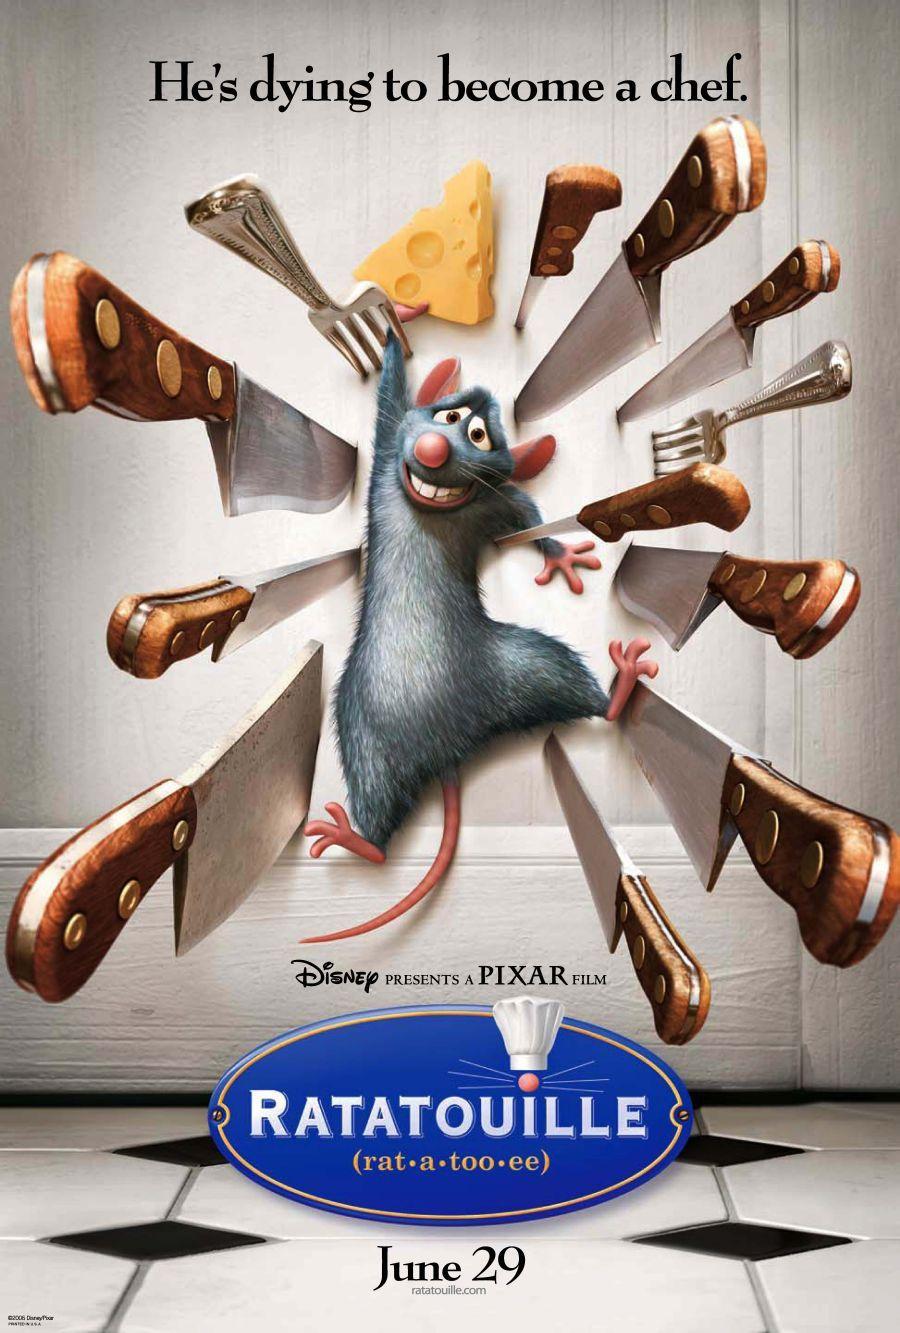 póster de la película ratatouille